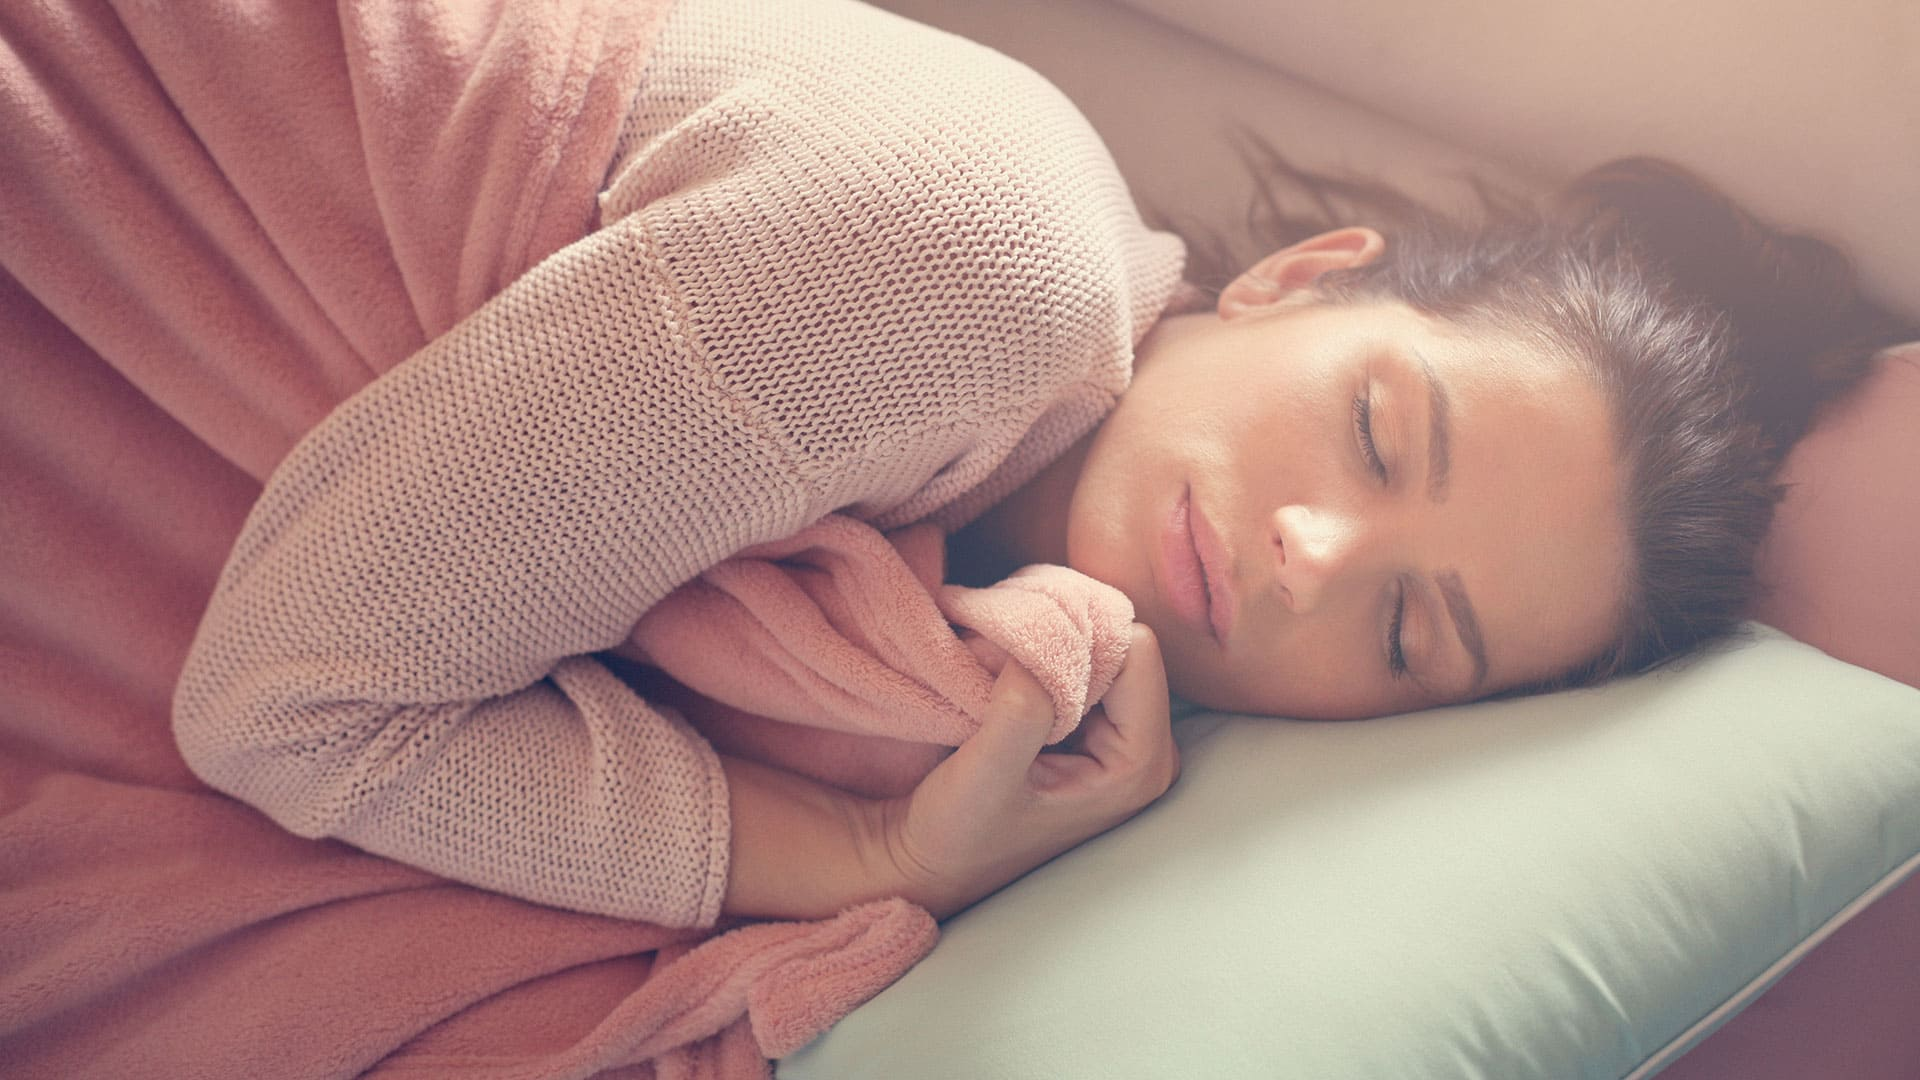 sound_and_restful_sleep_with_ayurveda_1